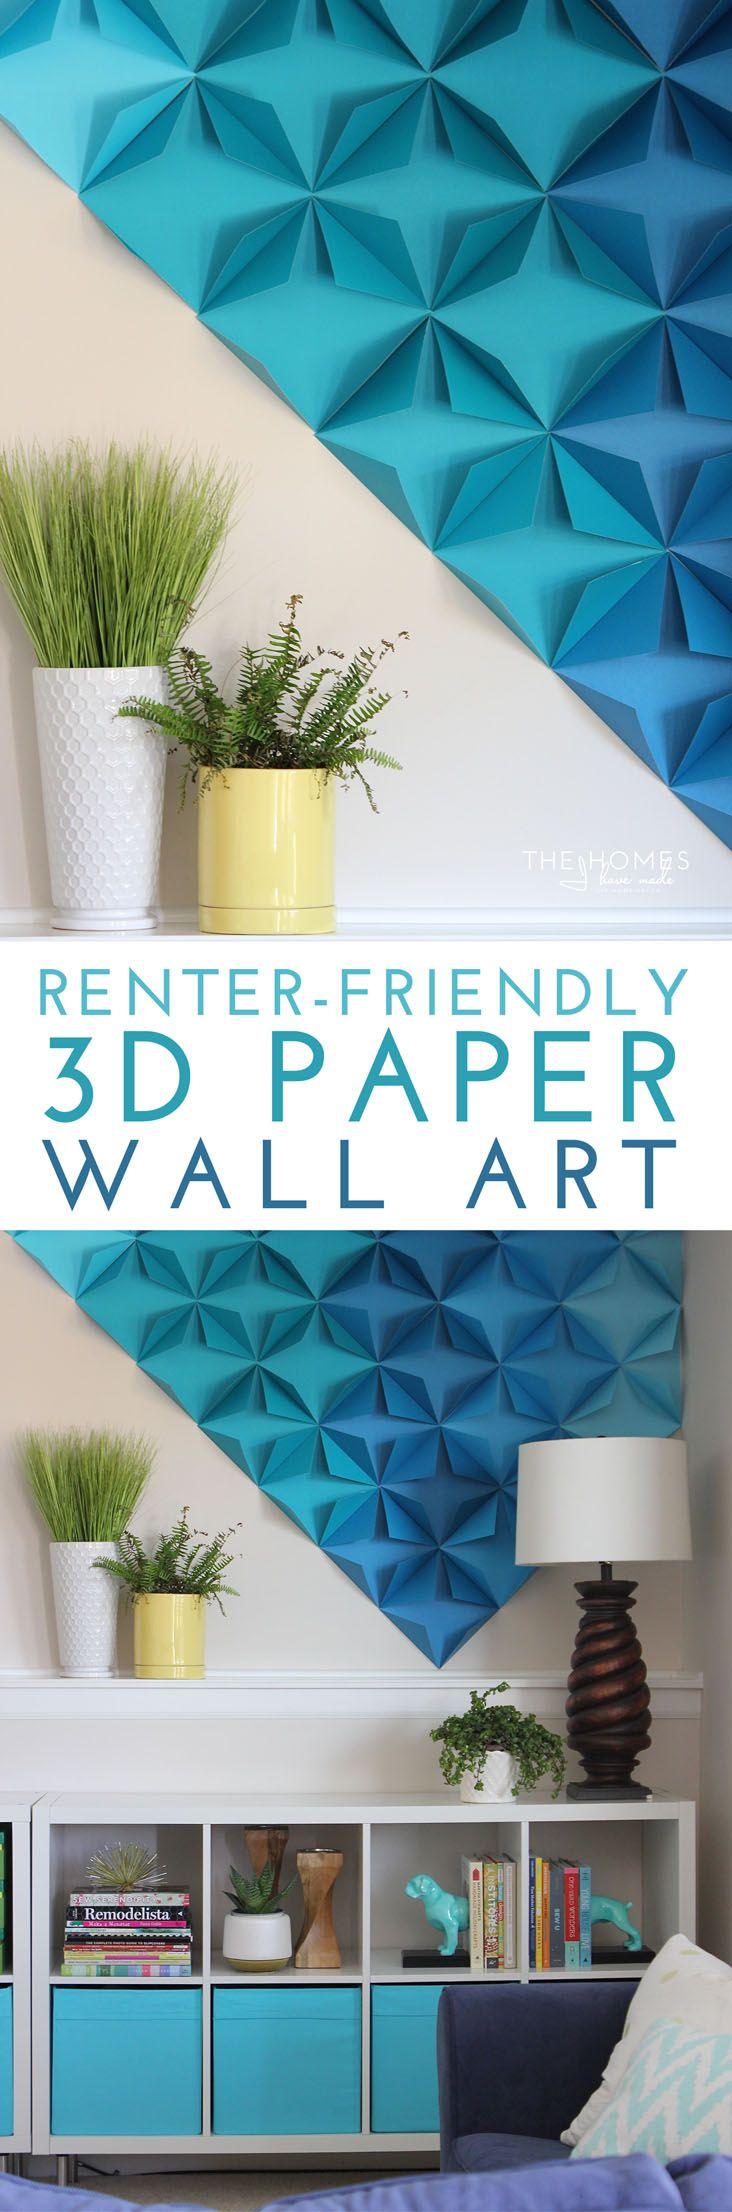 Renter-Friendly 3D Paper Wall Art   Paper wall art, Paper walls ...